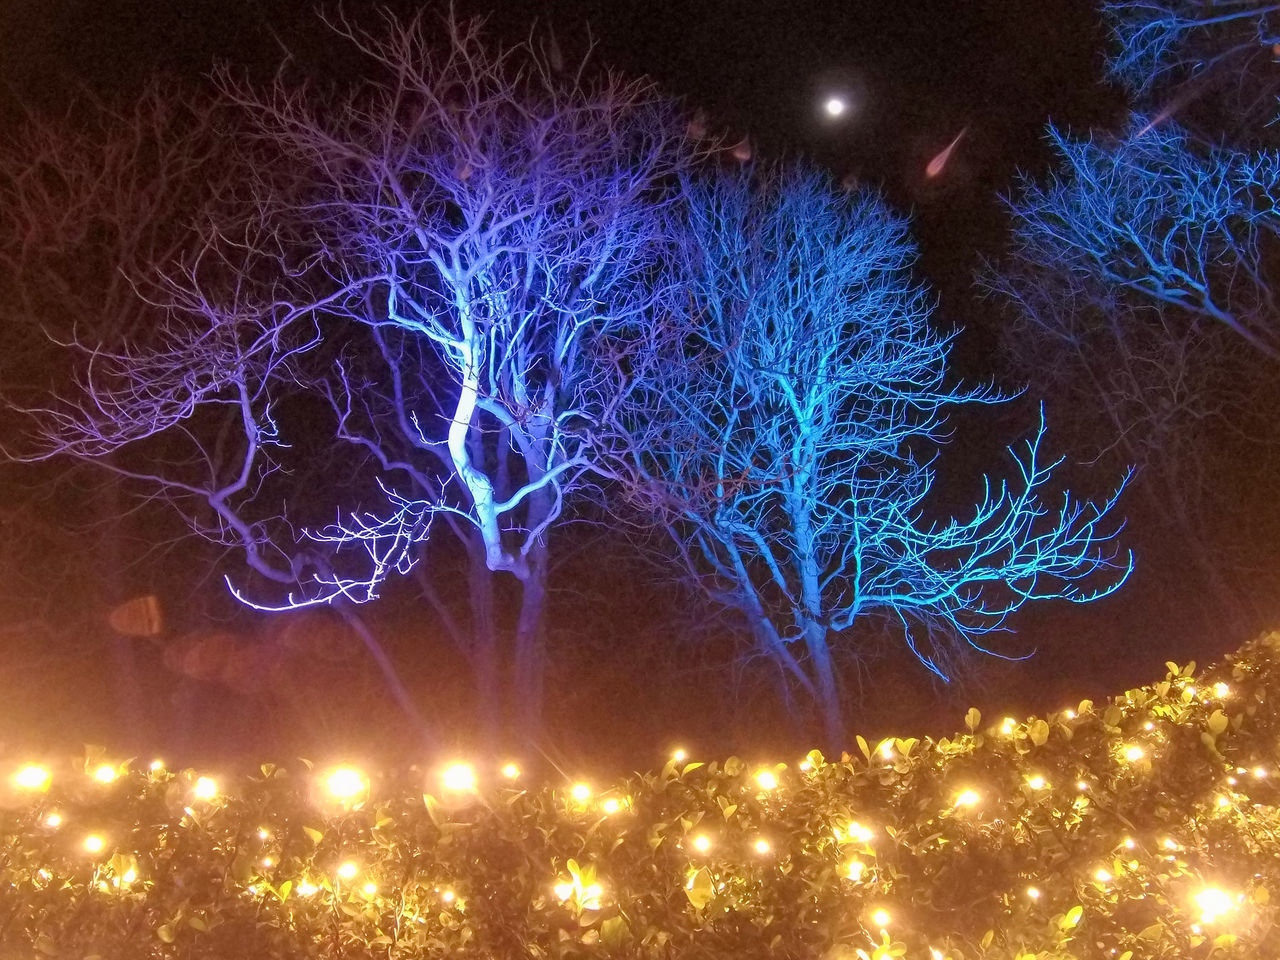 FIREWORK DISPLAY OVER ILLUMINATED TREES AGAINST SKY AT NIGHT